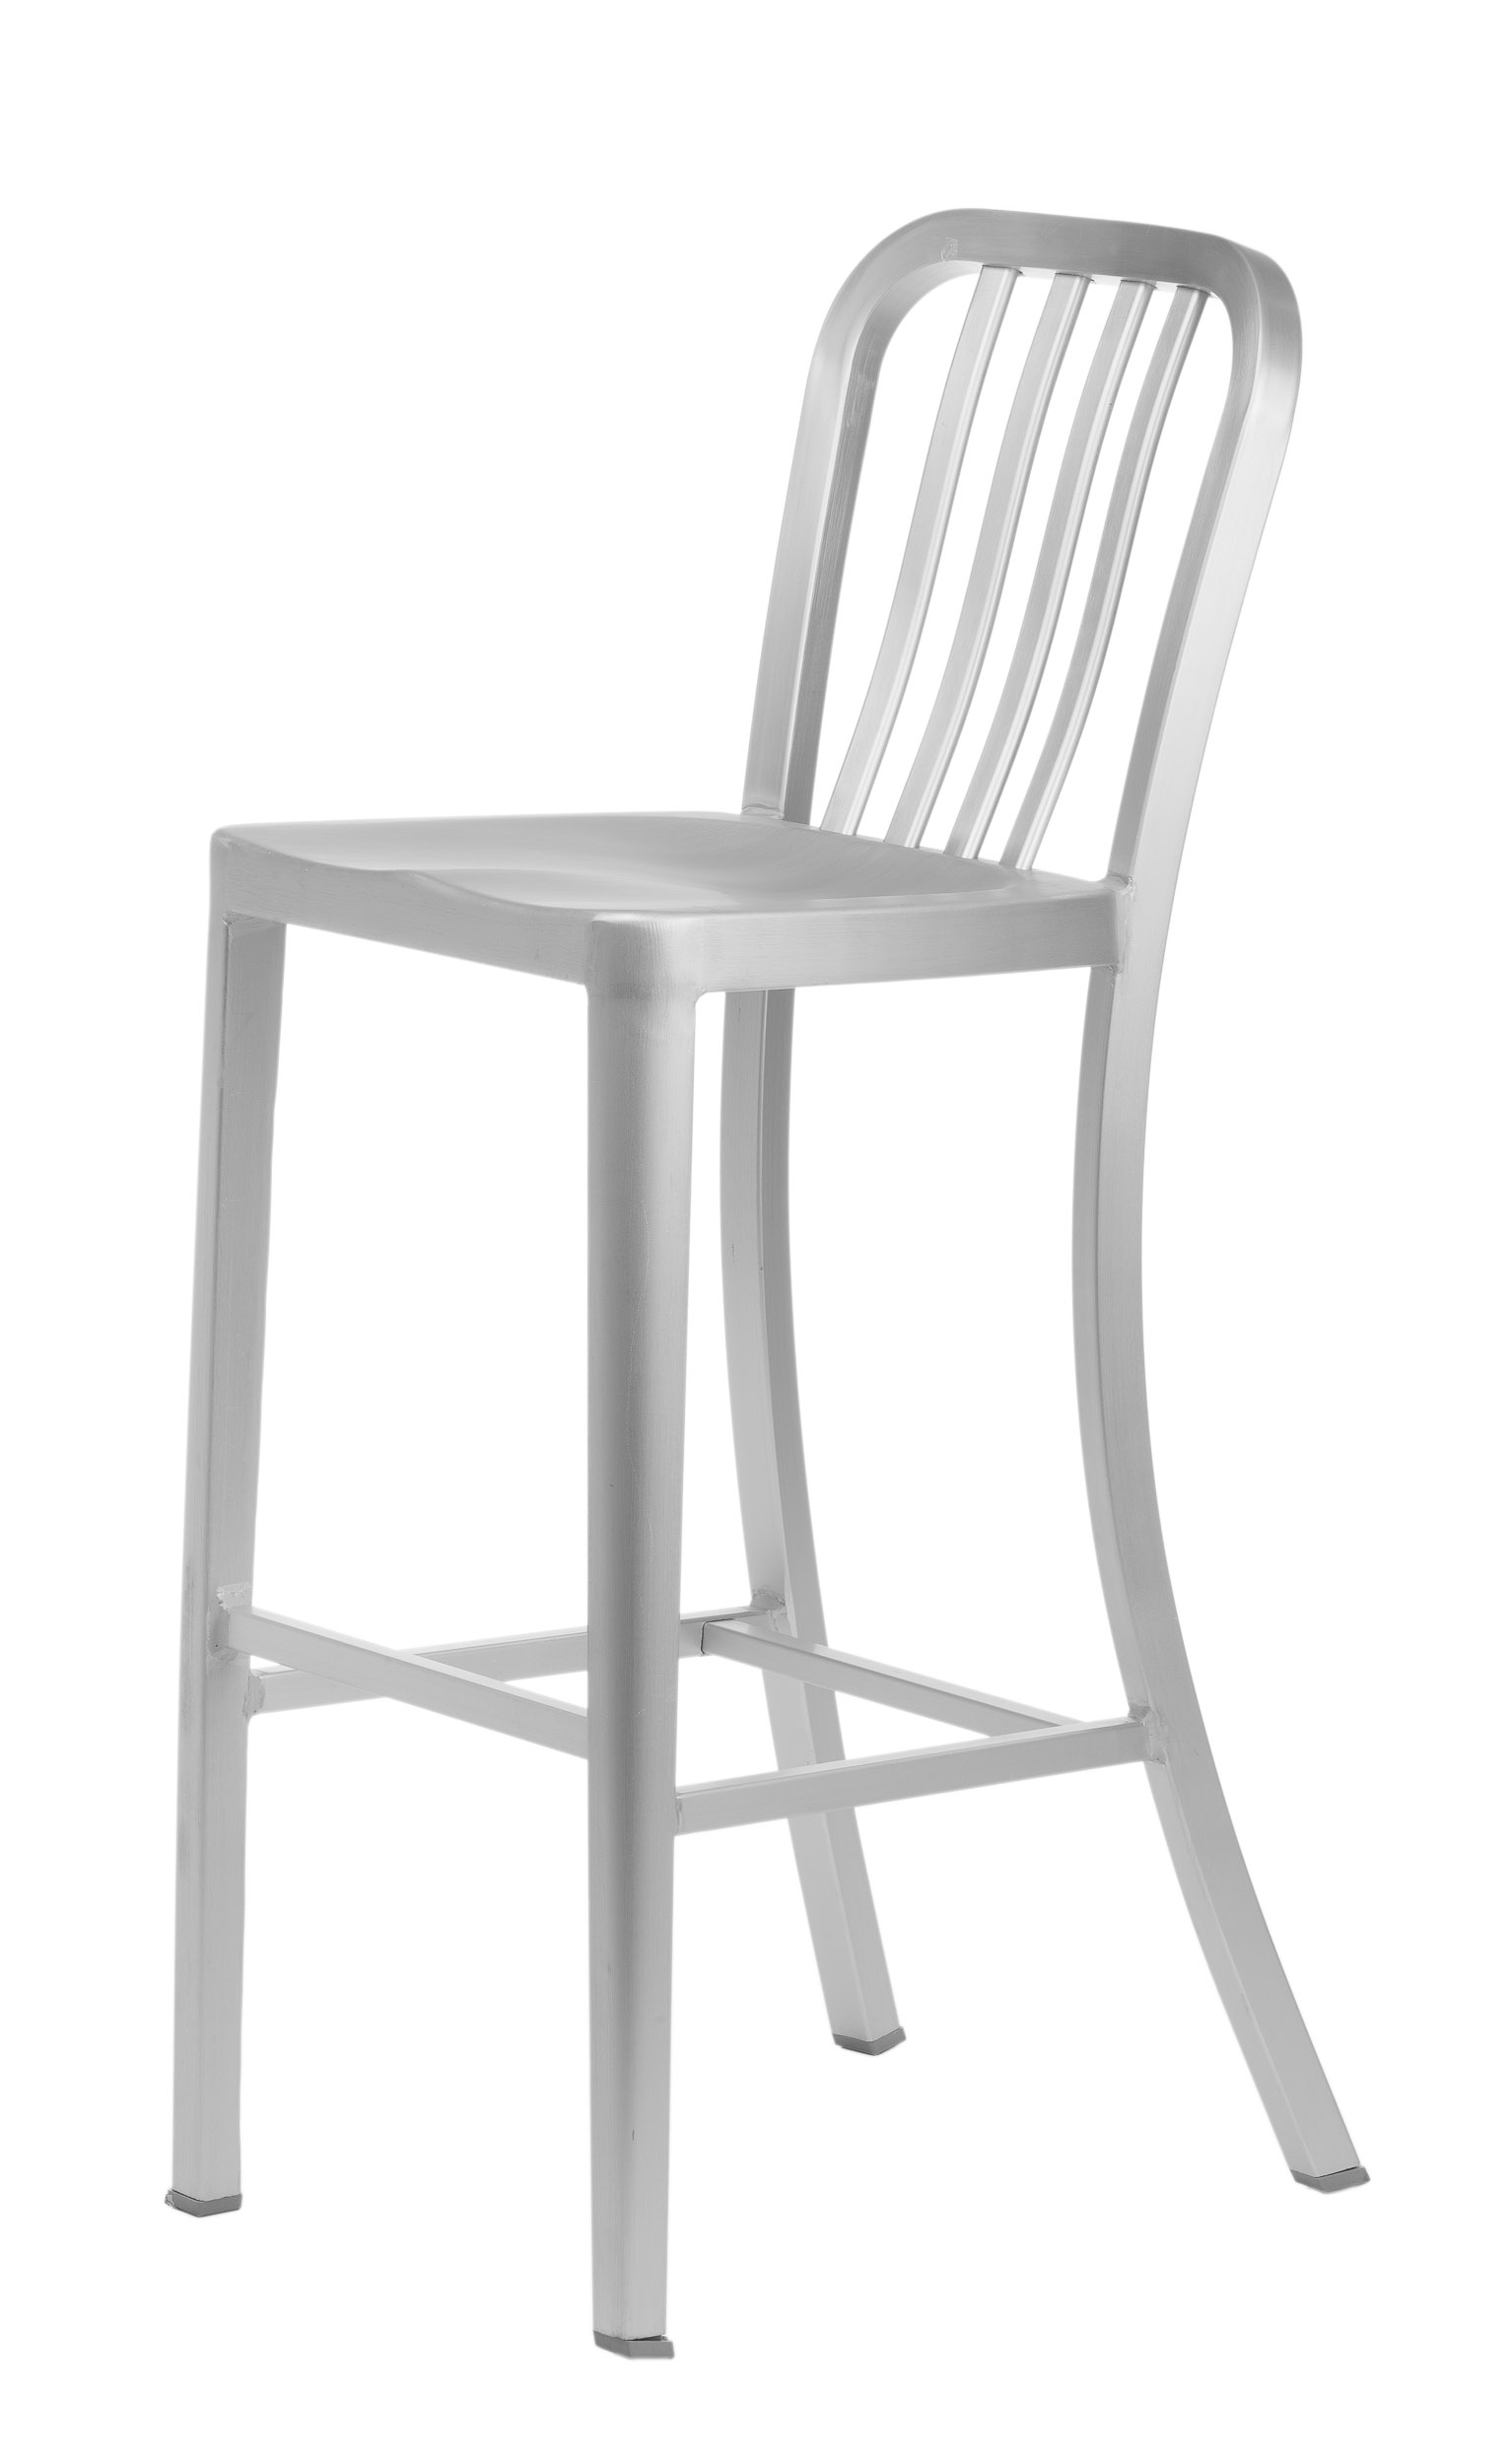 brushed aluminum chairs lightweight caravan elegant rtty1